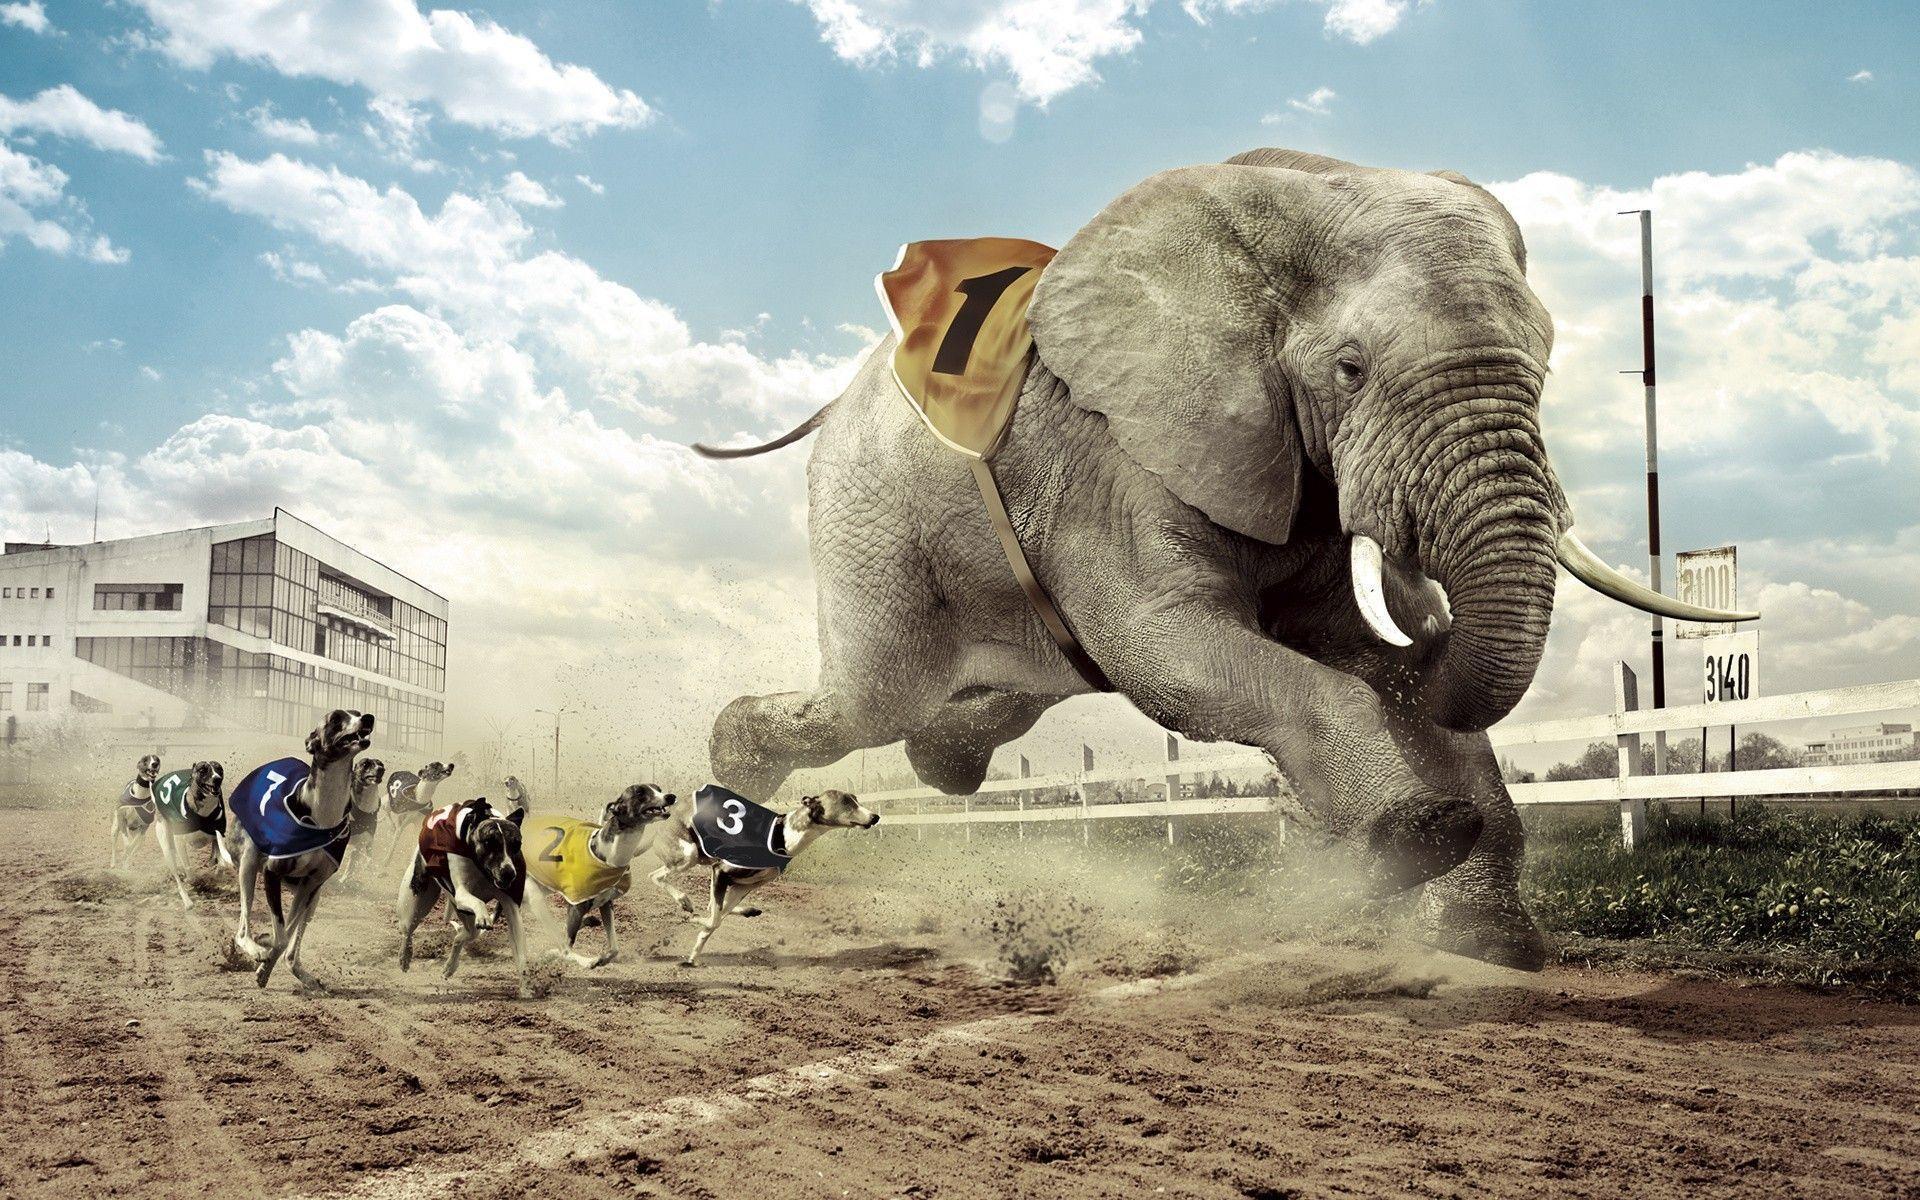 Dogs racing an elephant Wallpaper #